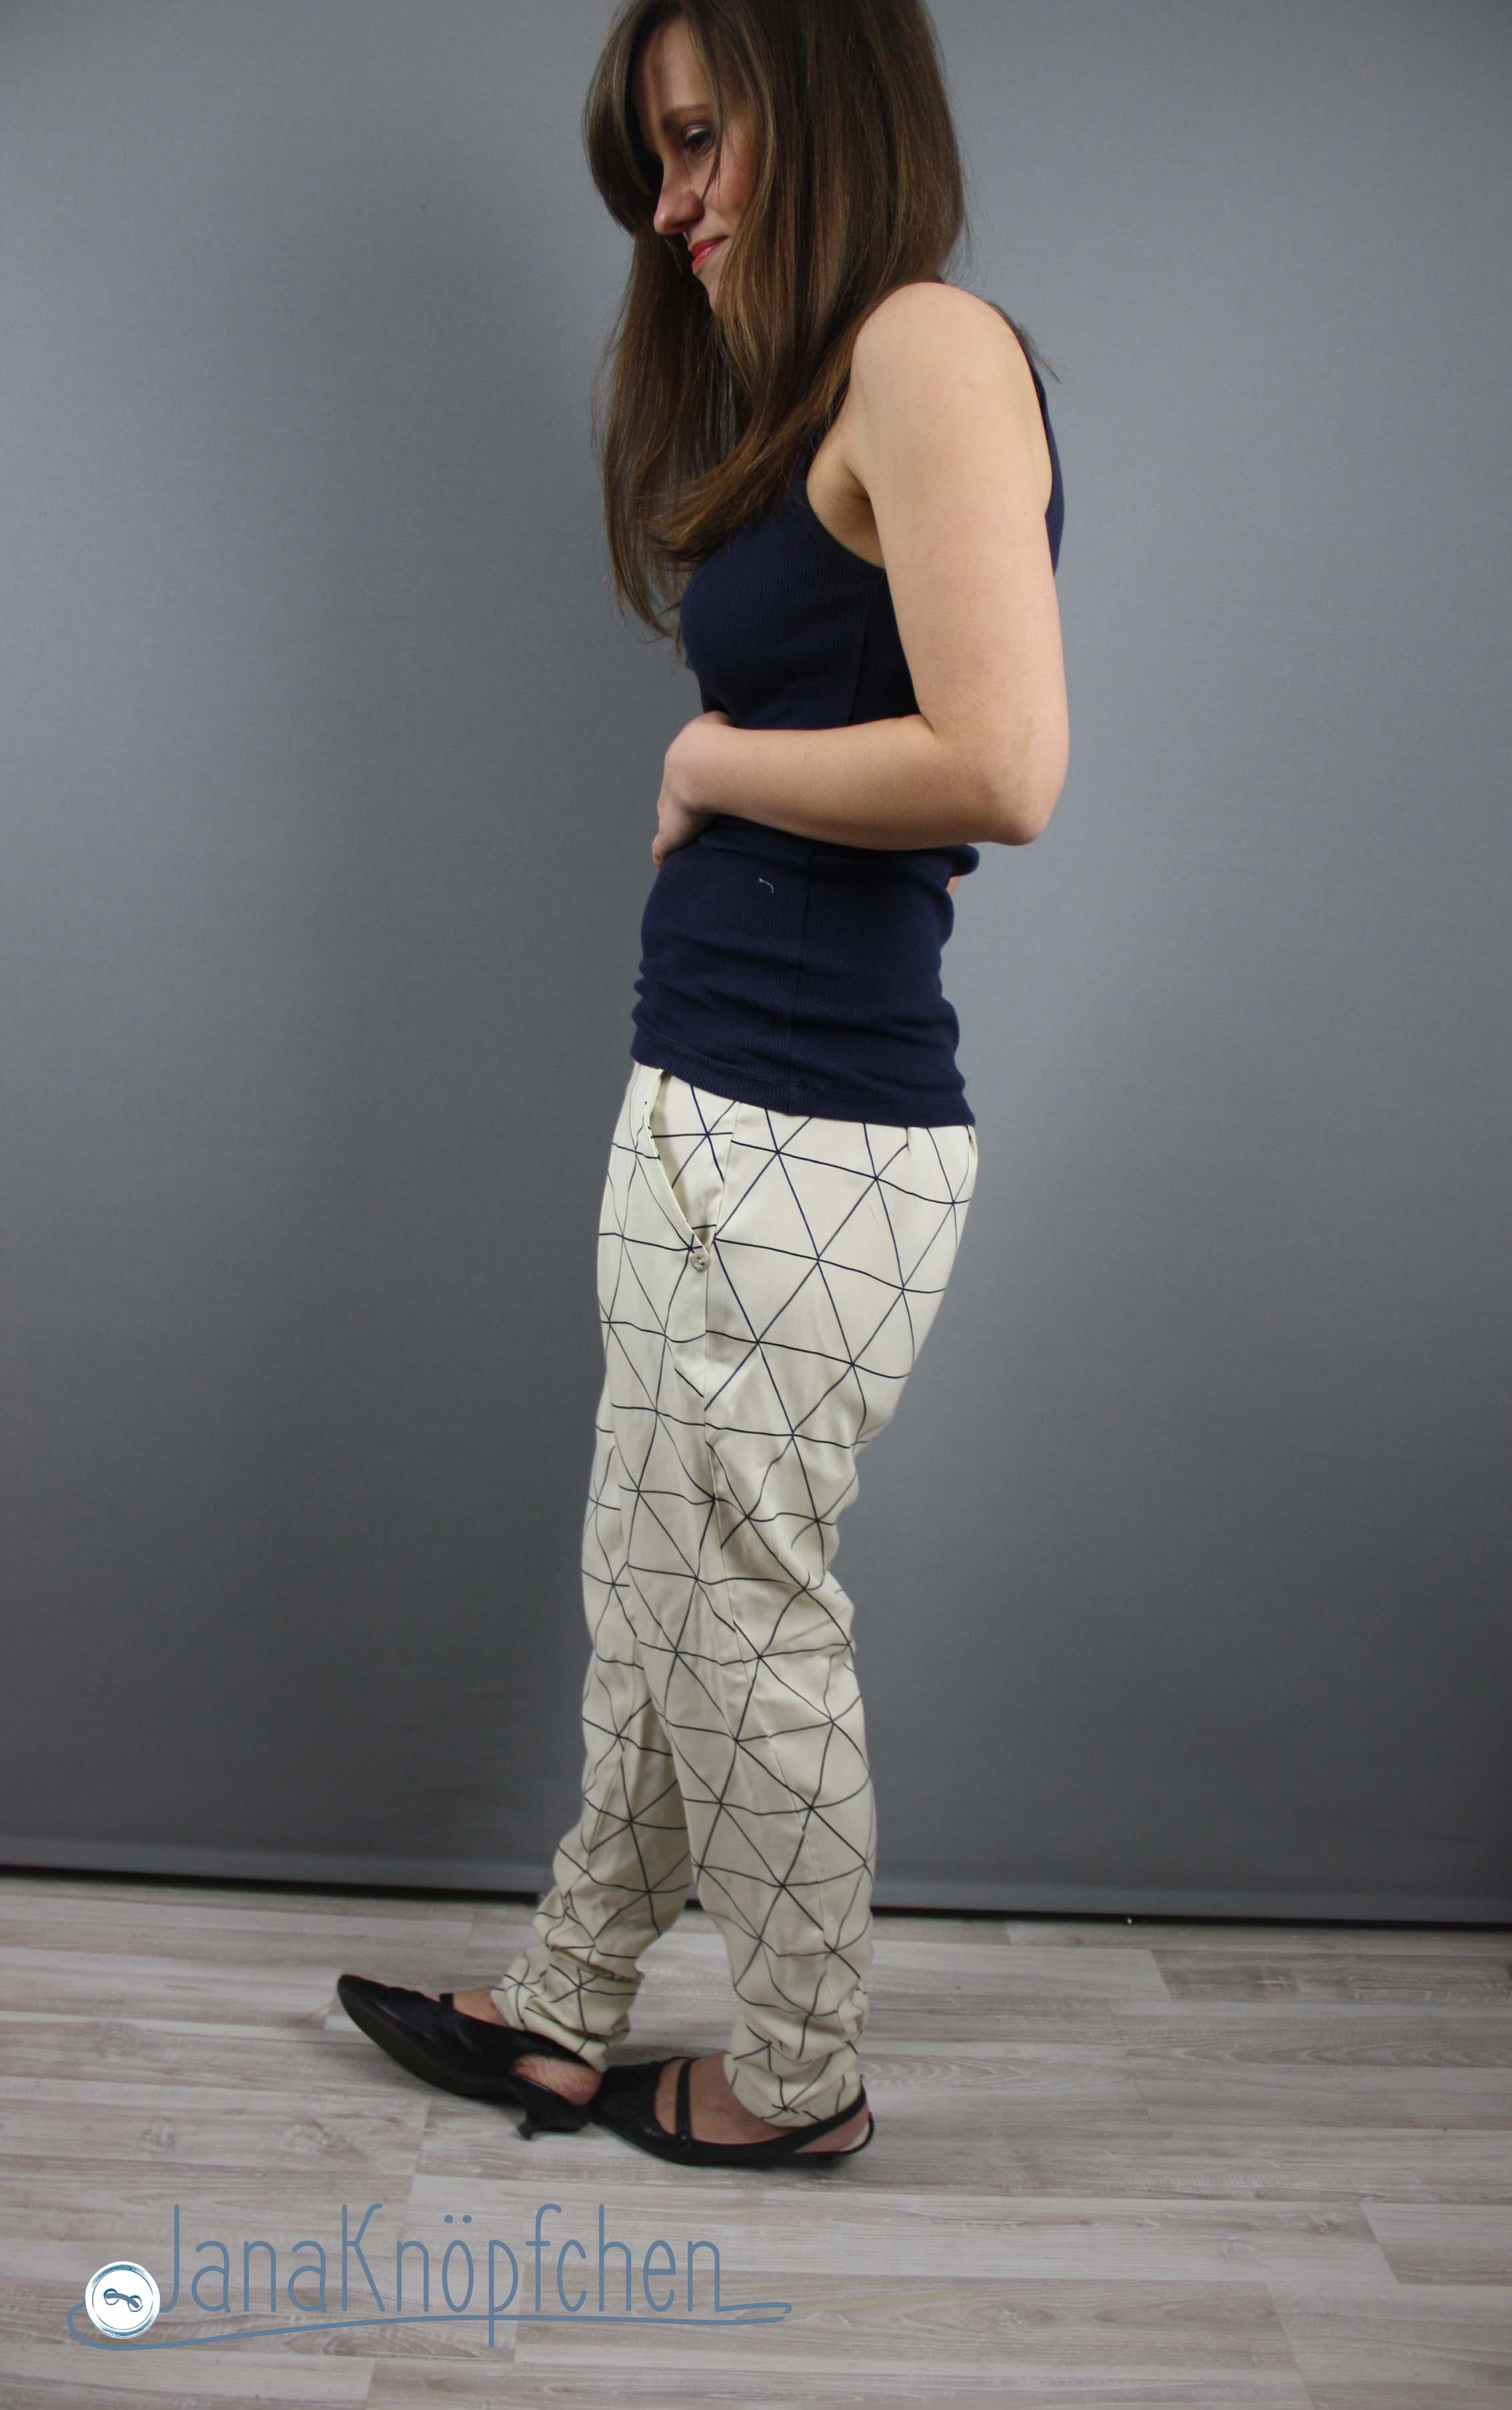 hose jenna naehen. JanaKnöpfchen - Nähen für jungs. Nähblog 12 colors of handmade fashion